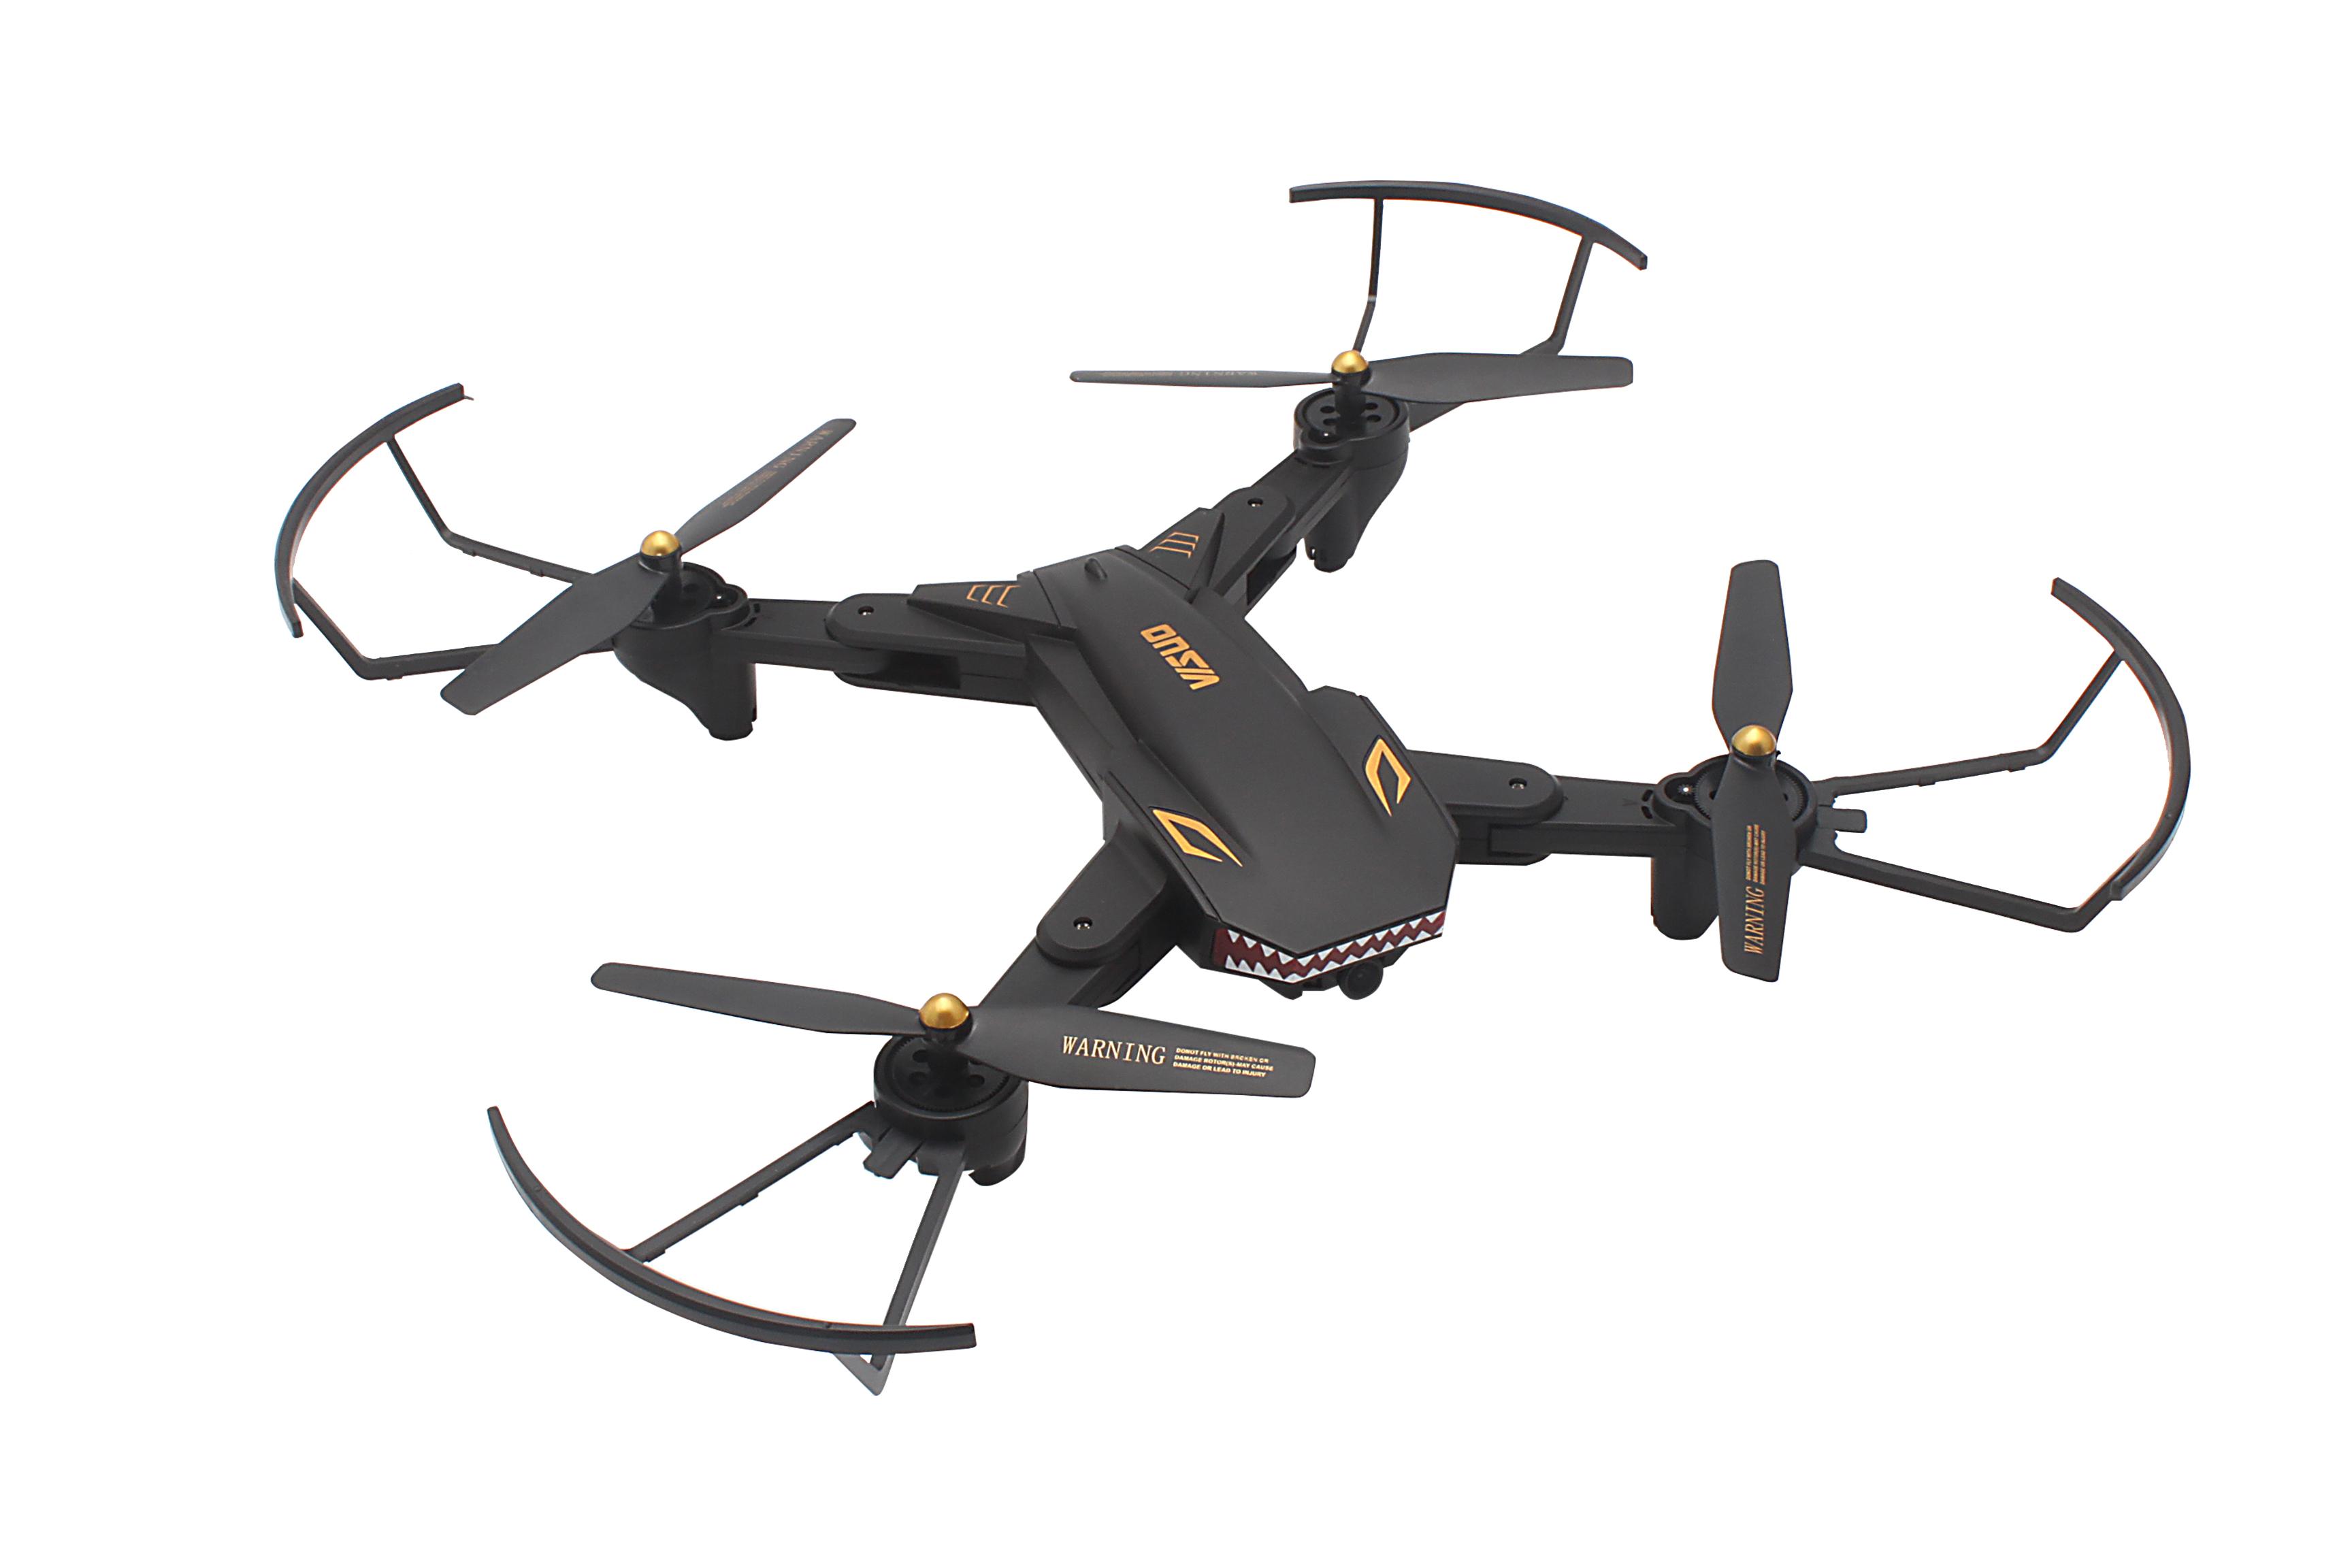 images/bulk-wholesale/TIANQU-VISUO-XS809S-Drone-Foldable-Design-6-Axis-Gyro-20-Min-Flight-Time-App-Support-FPV-HD-Video-50m-Range-plusbuyer_9.jpg